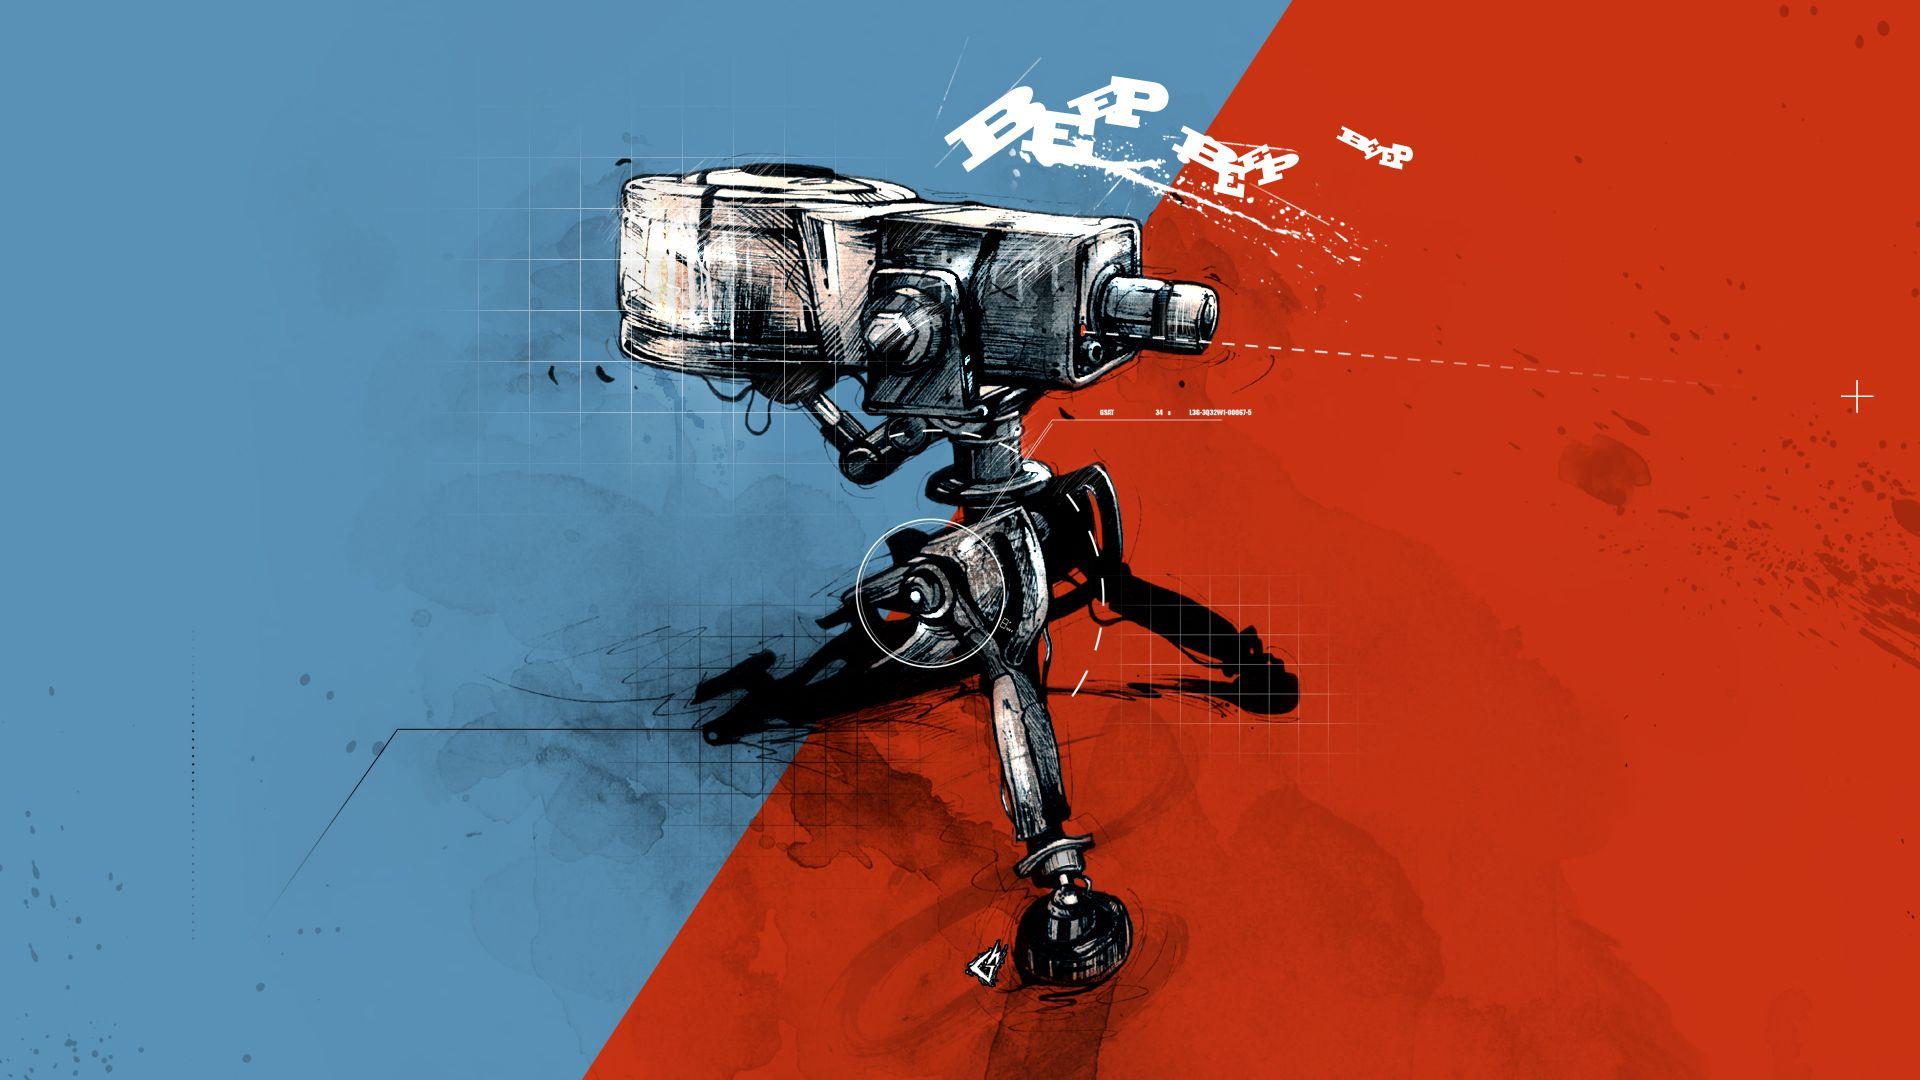 Wallpaper Team fortress 2 video game, robot